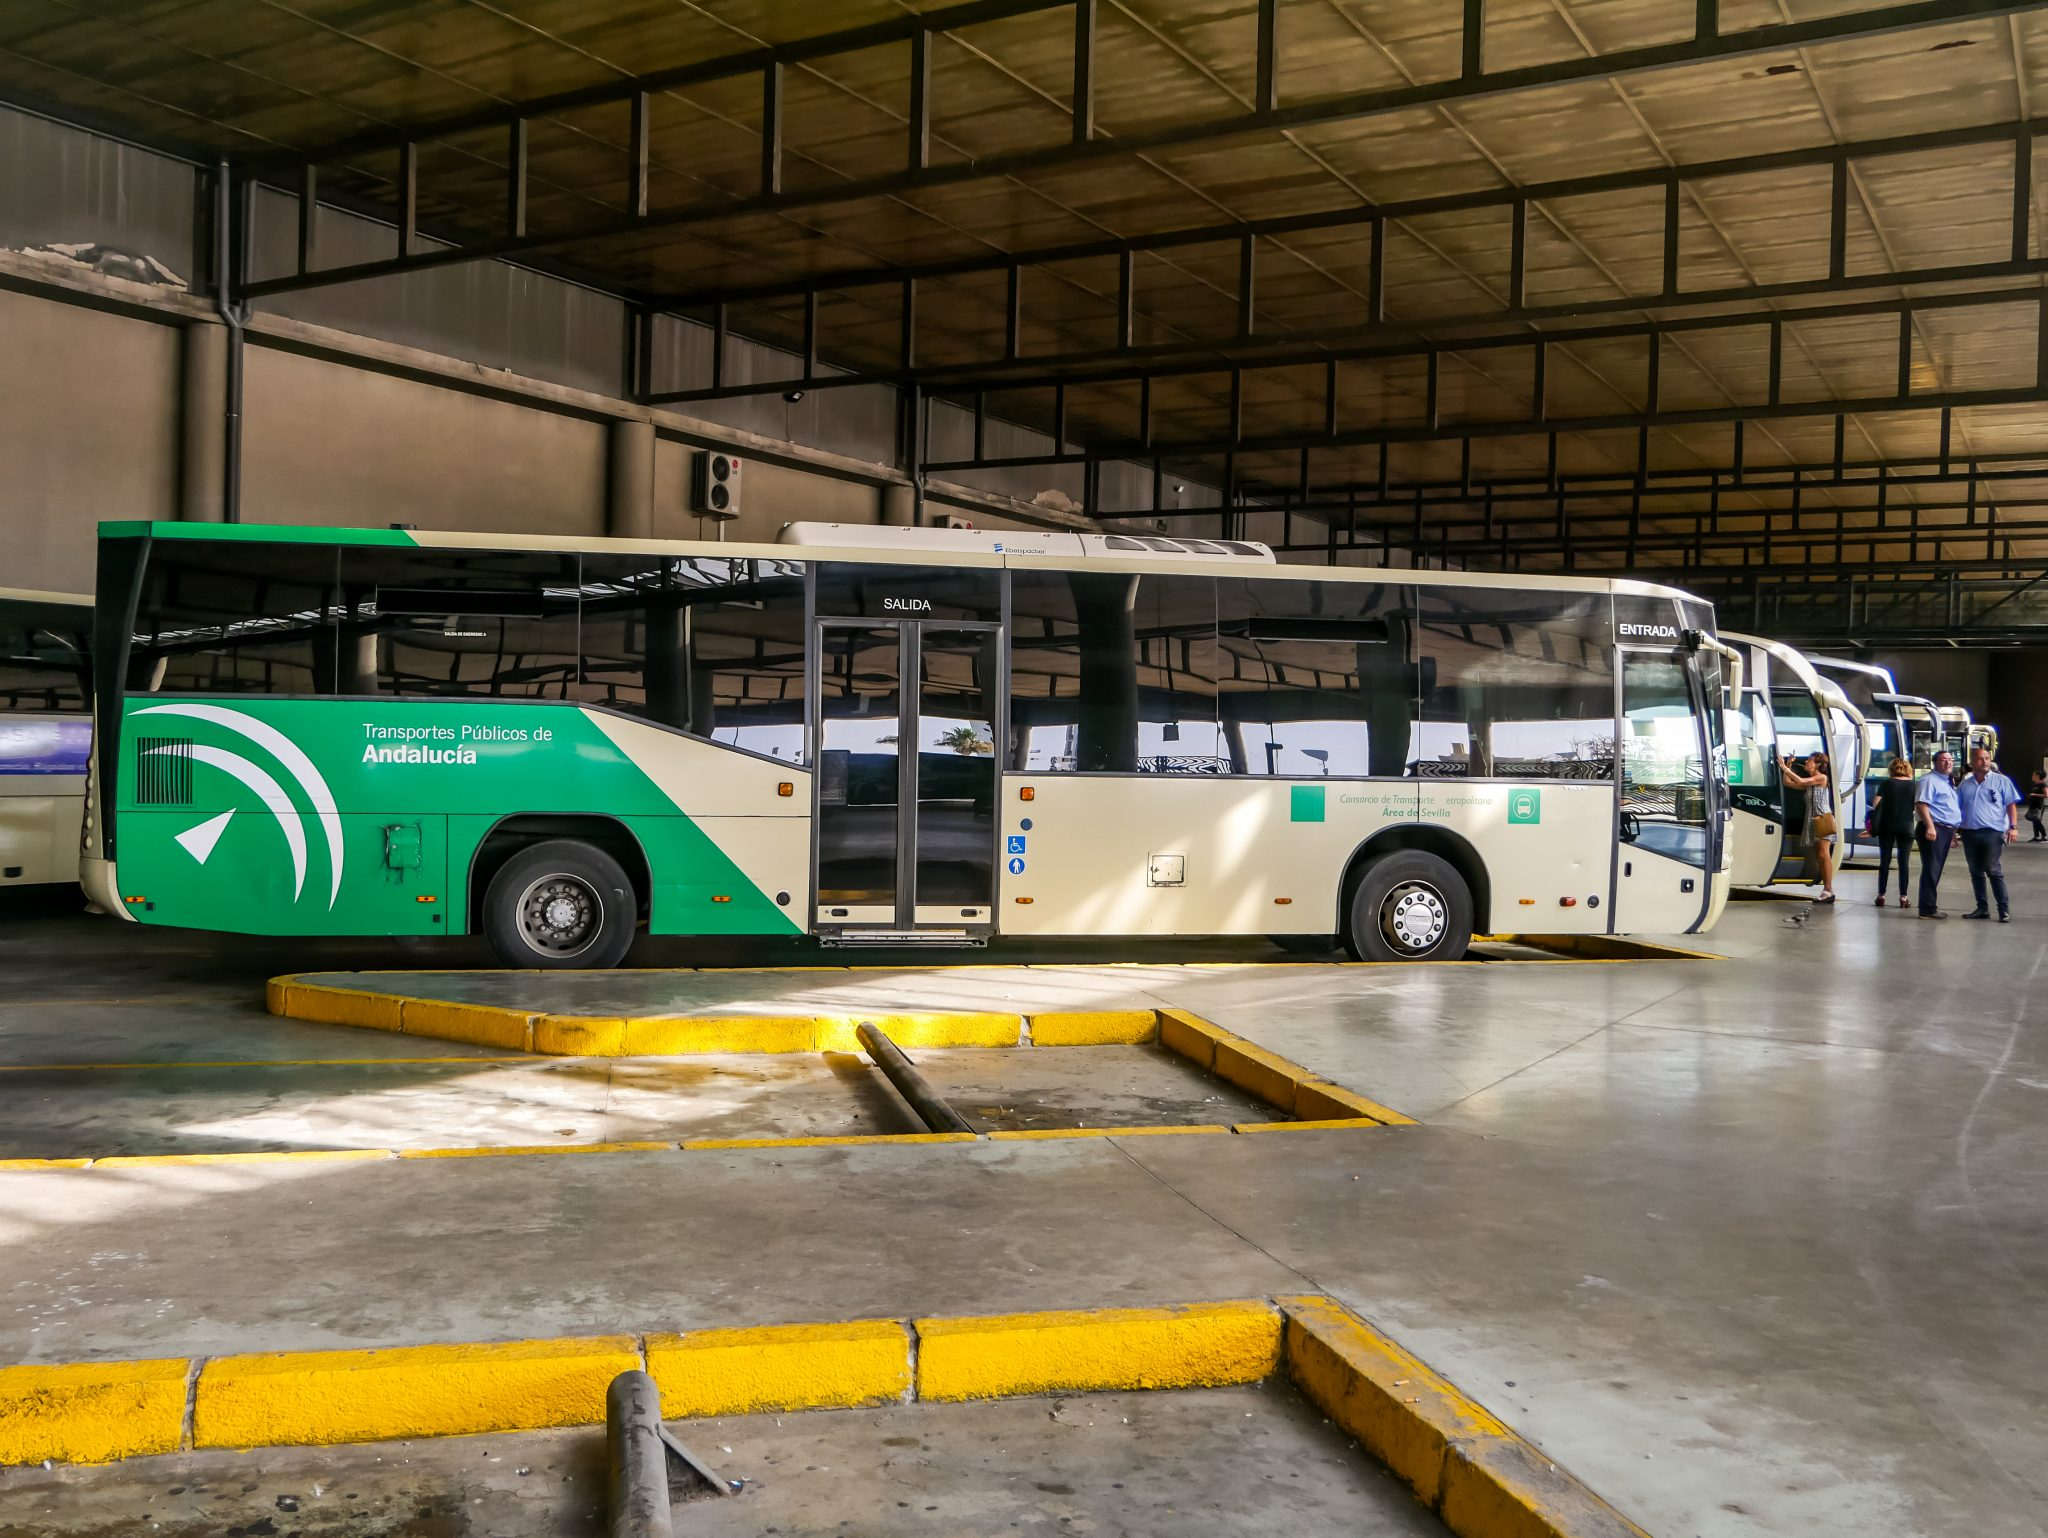 Busse am Plaza de Armas in Sevilla.